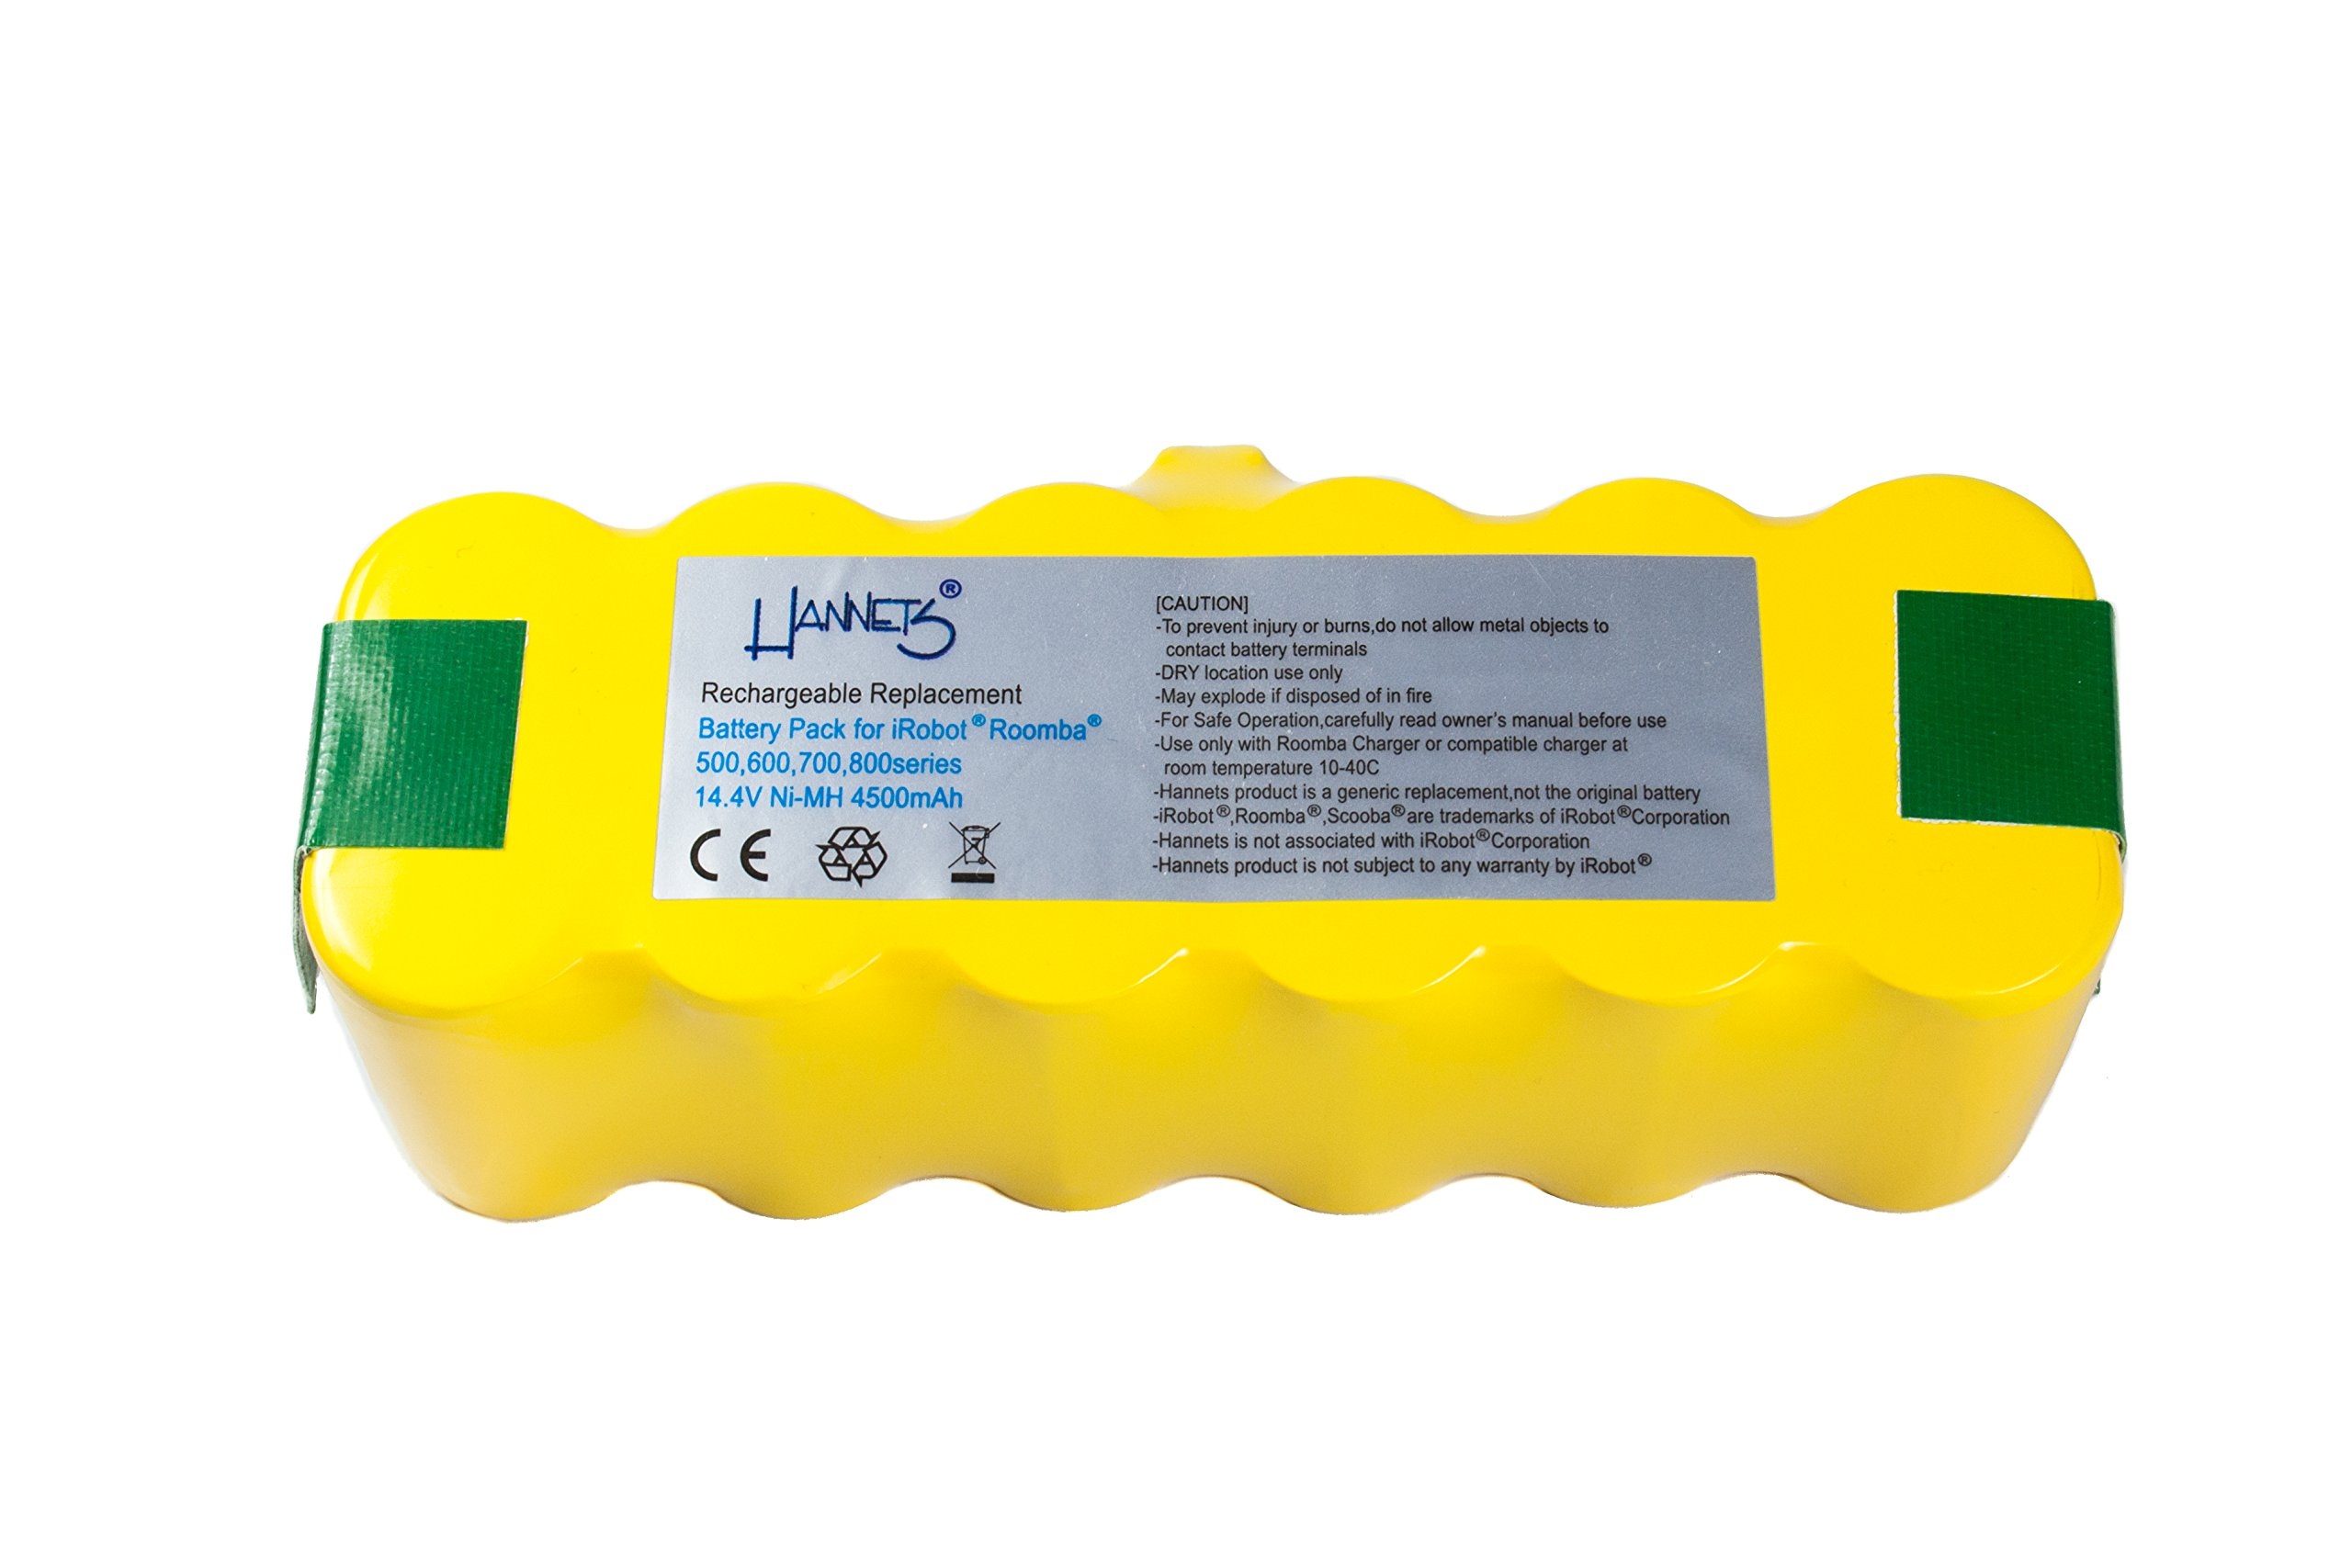 Batería Hannets® compatible con iRobot Roomba 630 I Batería i-Robot Batería Roomba Batería Aspiradora robotizada I Roomba 630 Accesorios 4500mAh Batería Robot de succión Batería de repuesto 14,4 V: Amazon.es: Electrónica